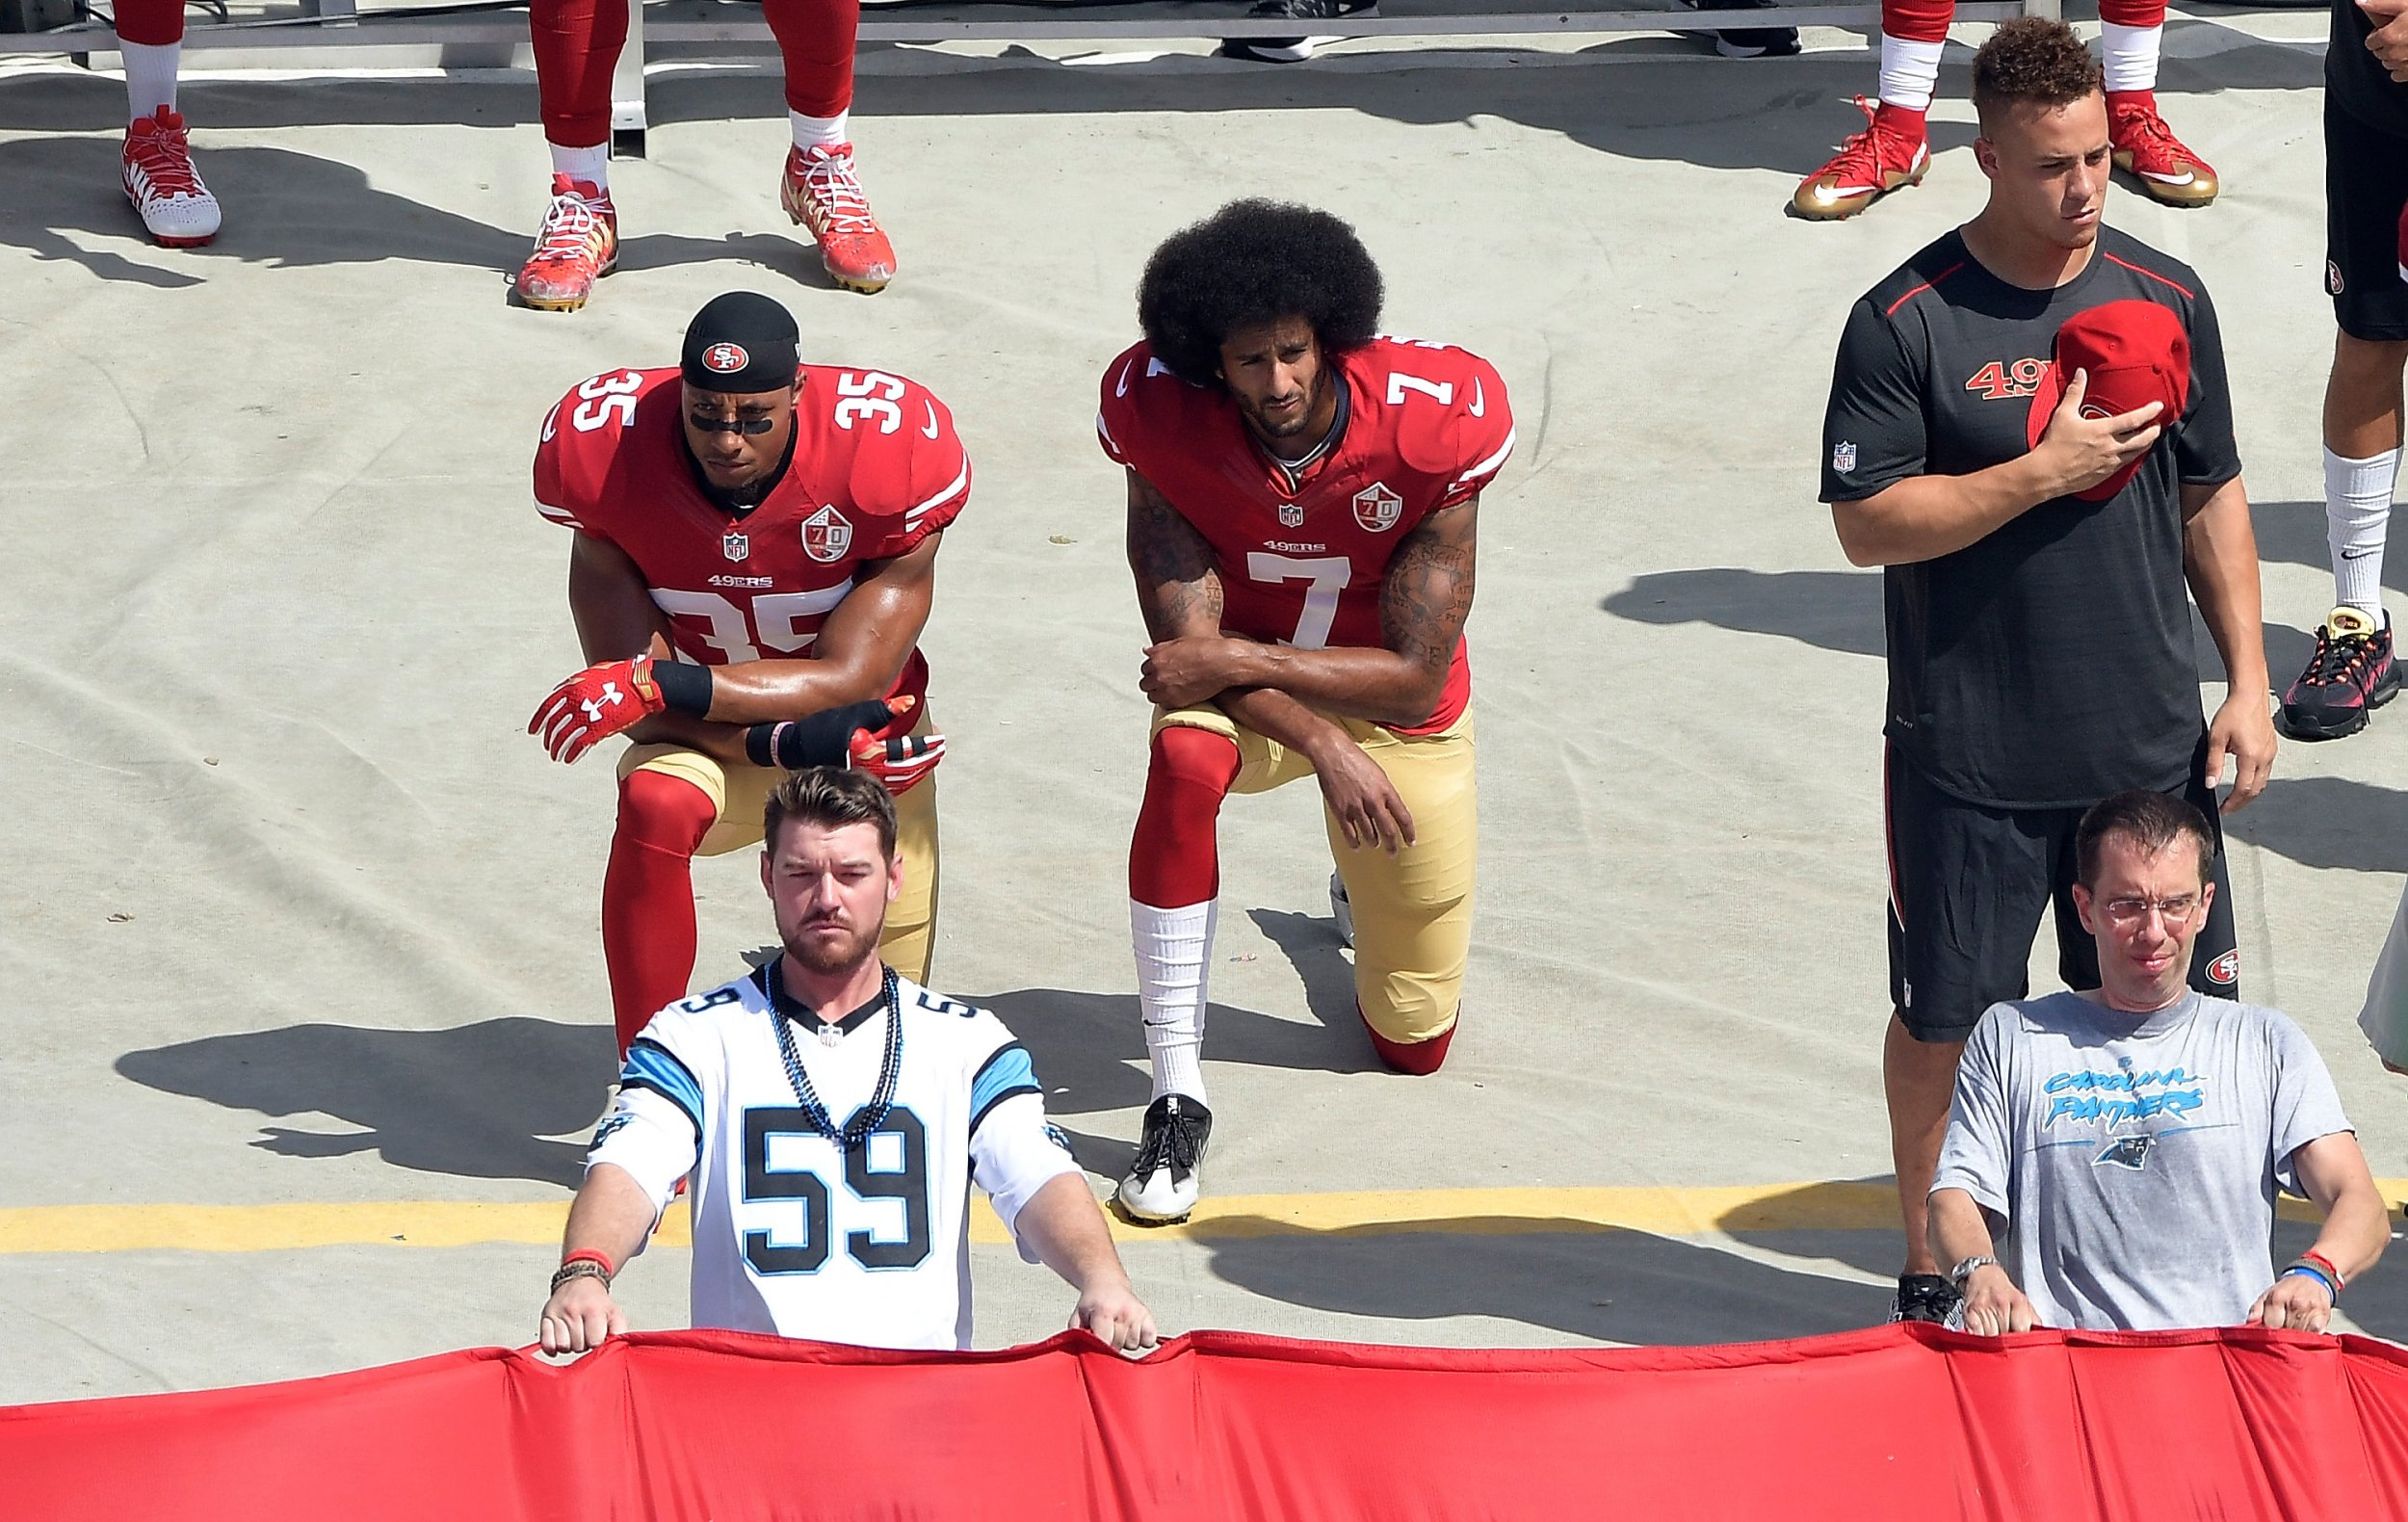 San Francisco 49ers quarterback Colin Kaepernick, center.